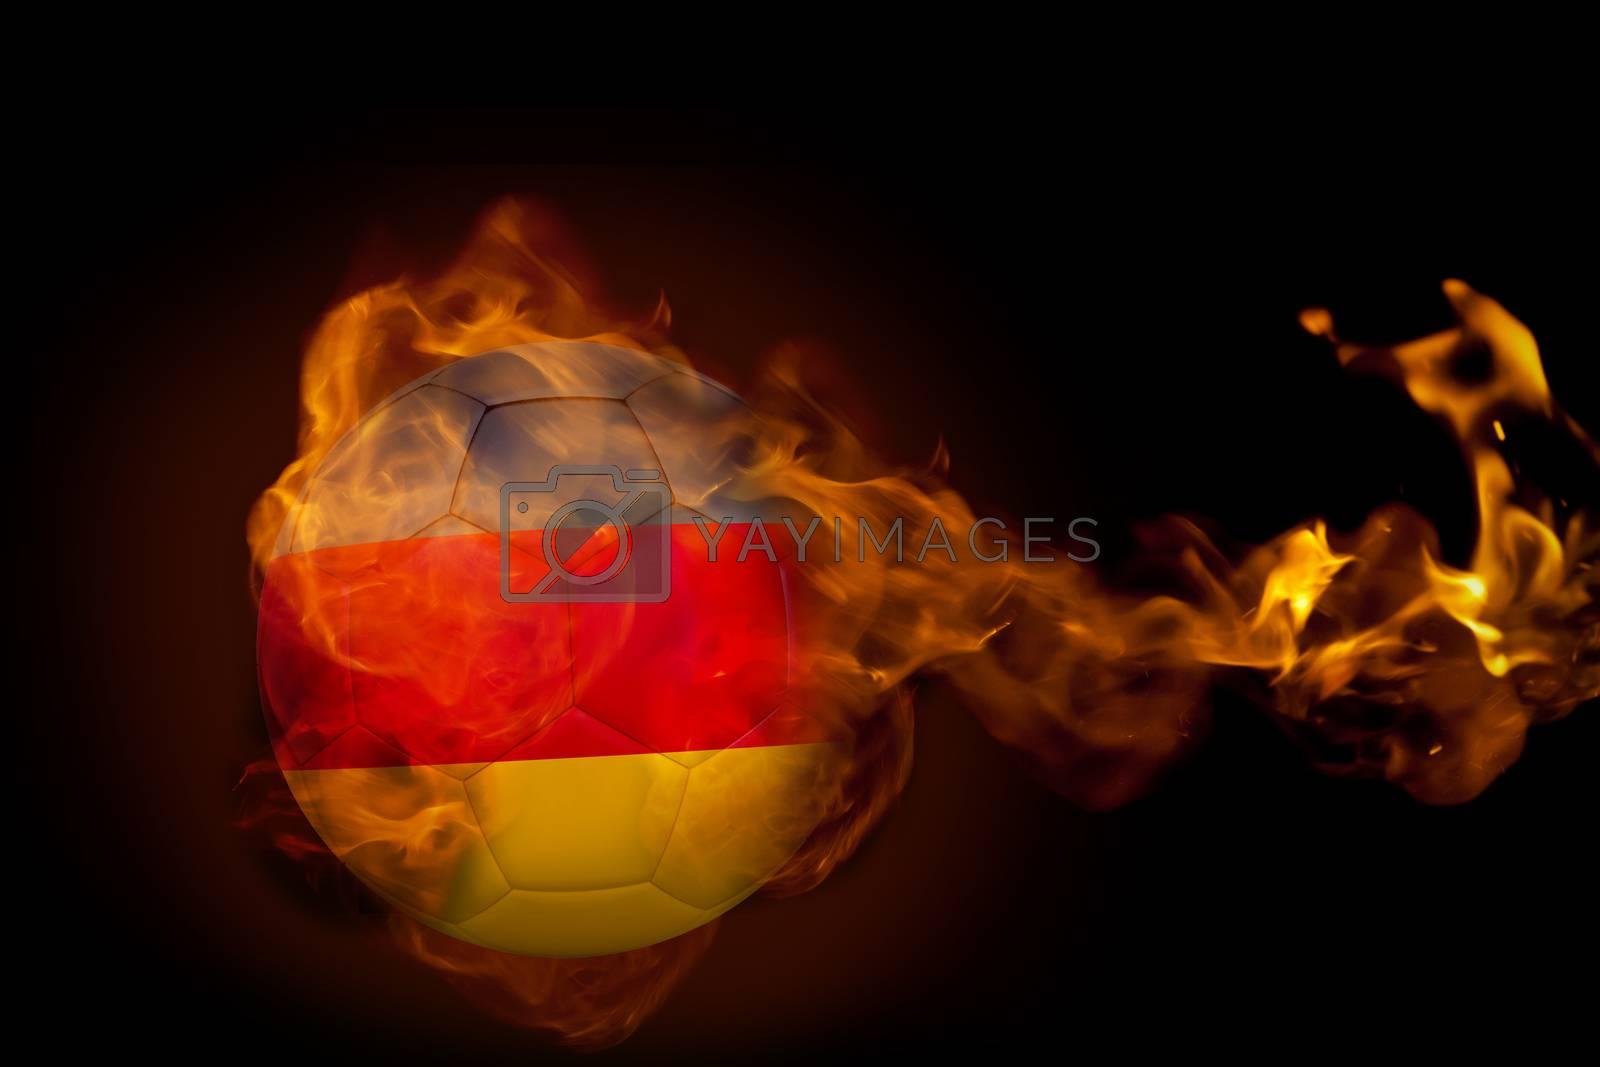 Fire surrounding germany ball by Wavebreakmedia